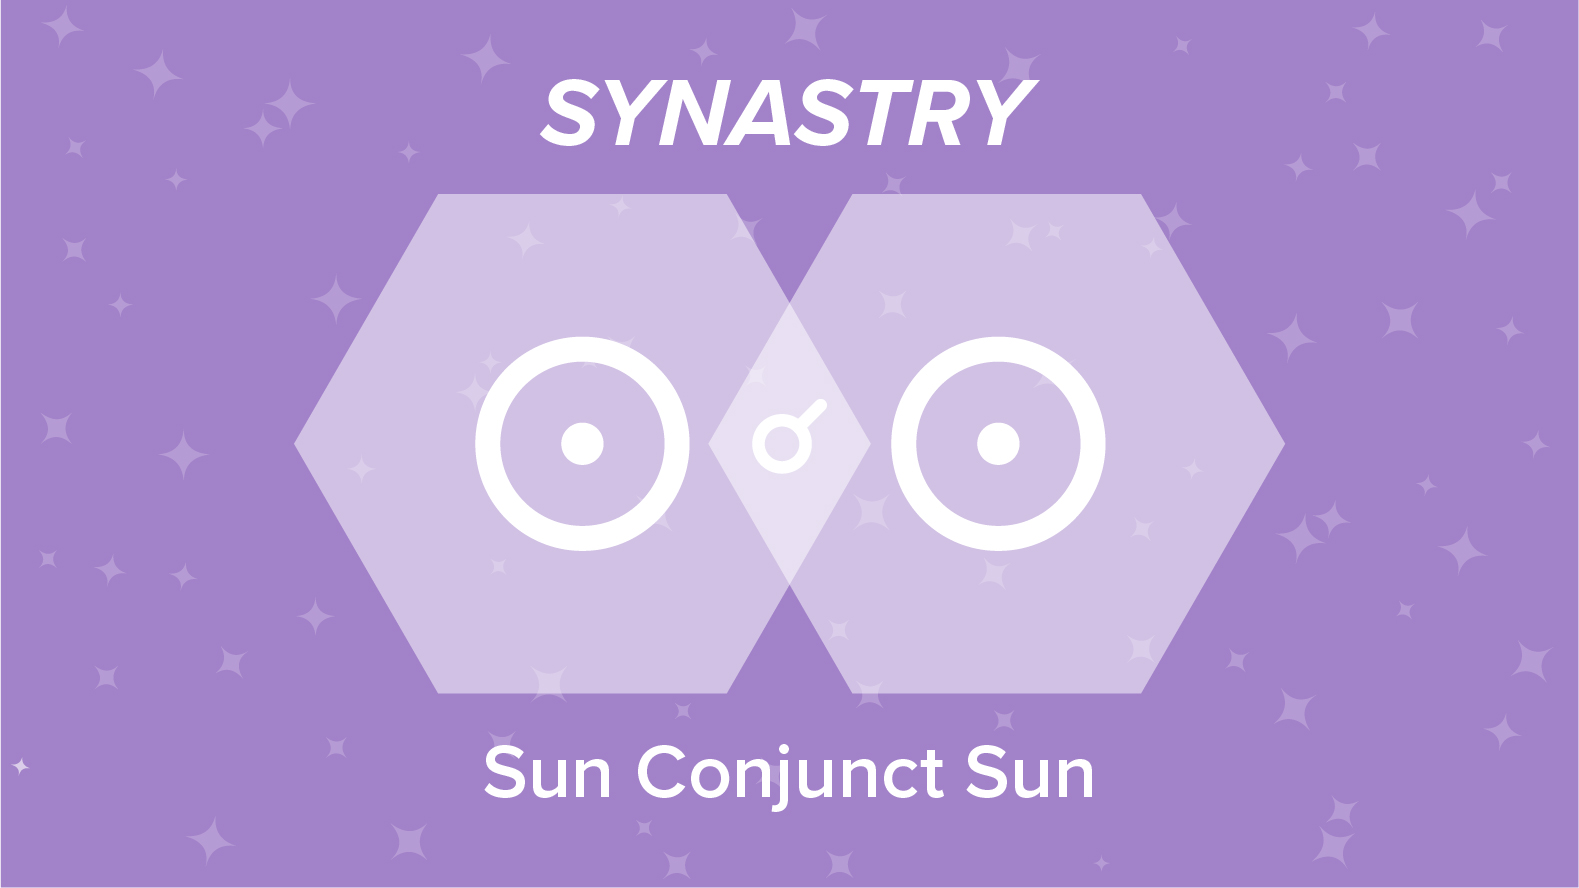 Sun Conjunct Sun Synastry